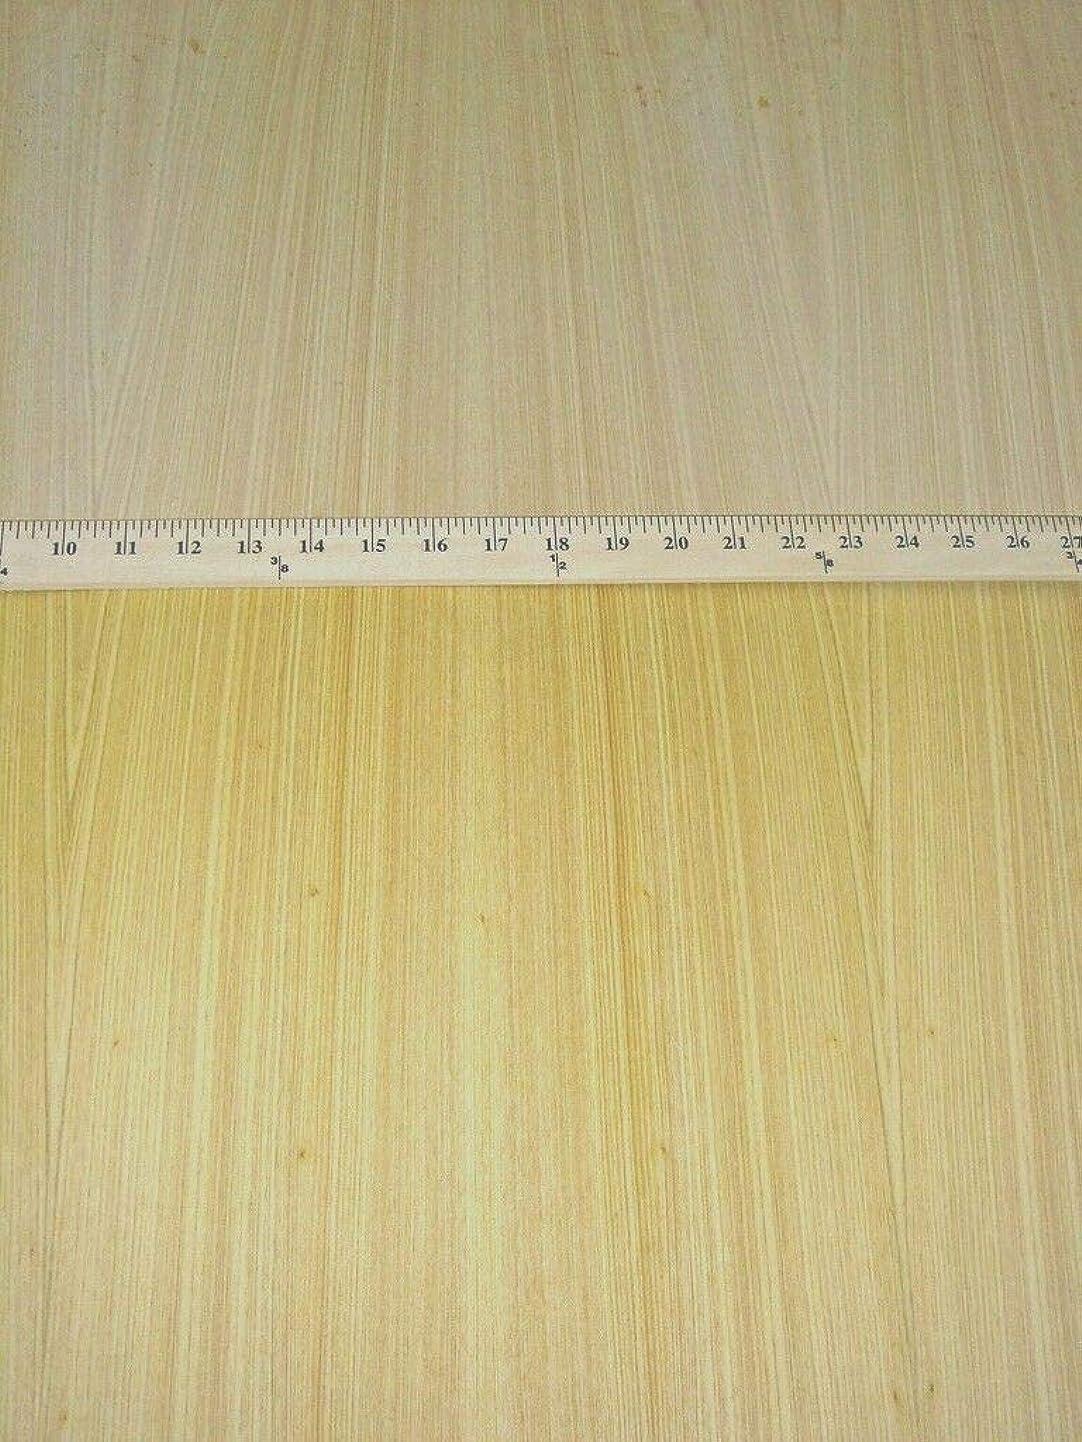 Cypress Australian wood veneer sheet 48